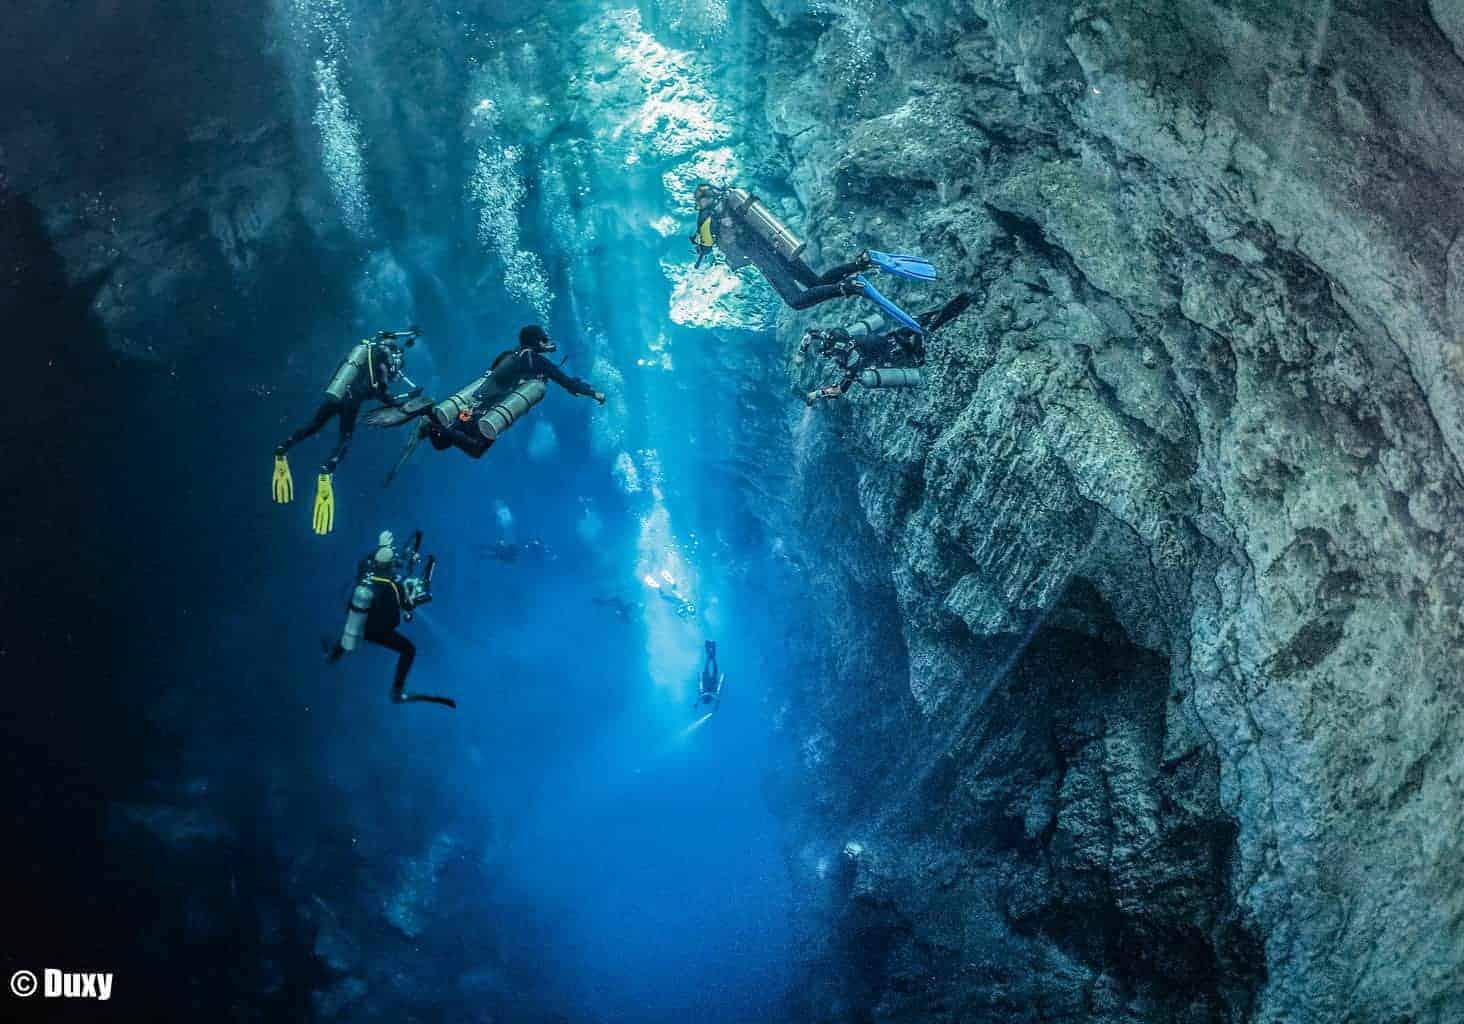 Cenote - courtesy Paul Duxfield (Duxy)